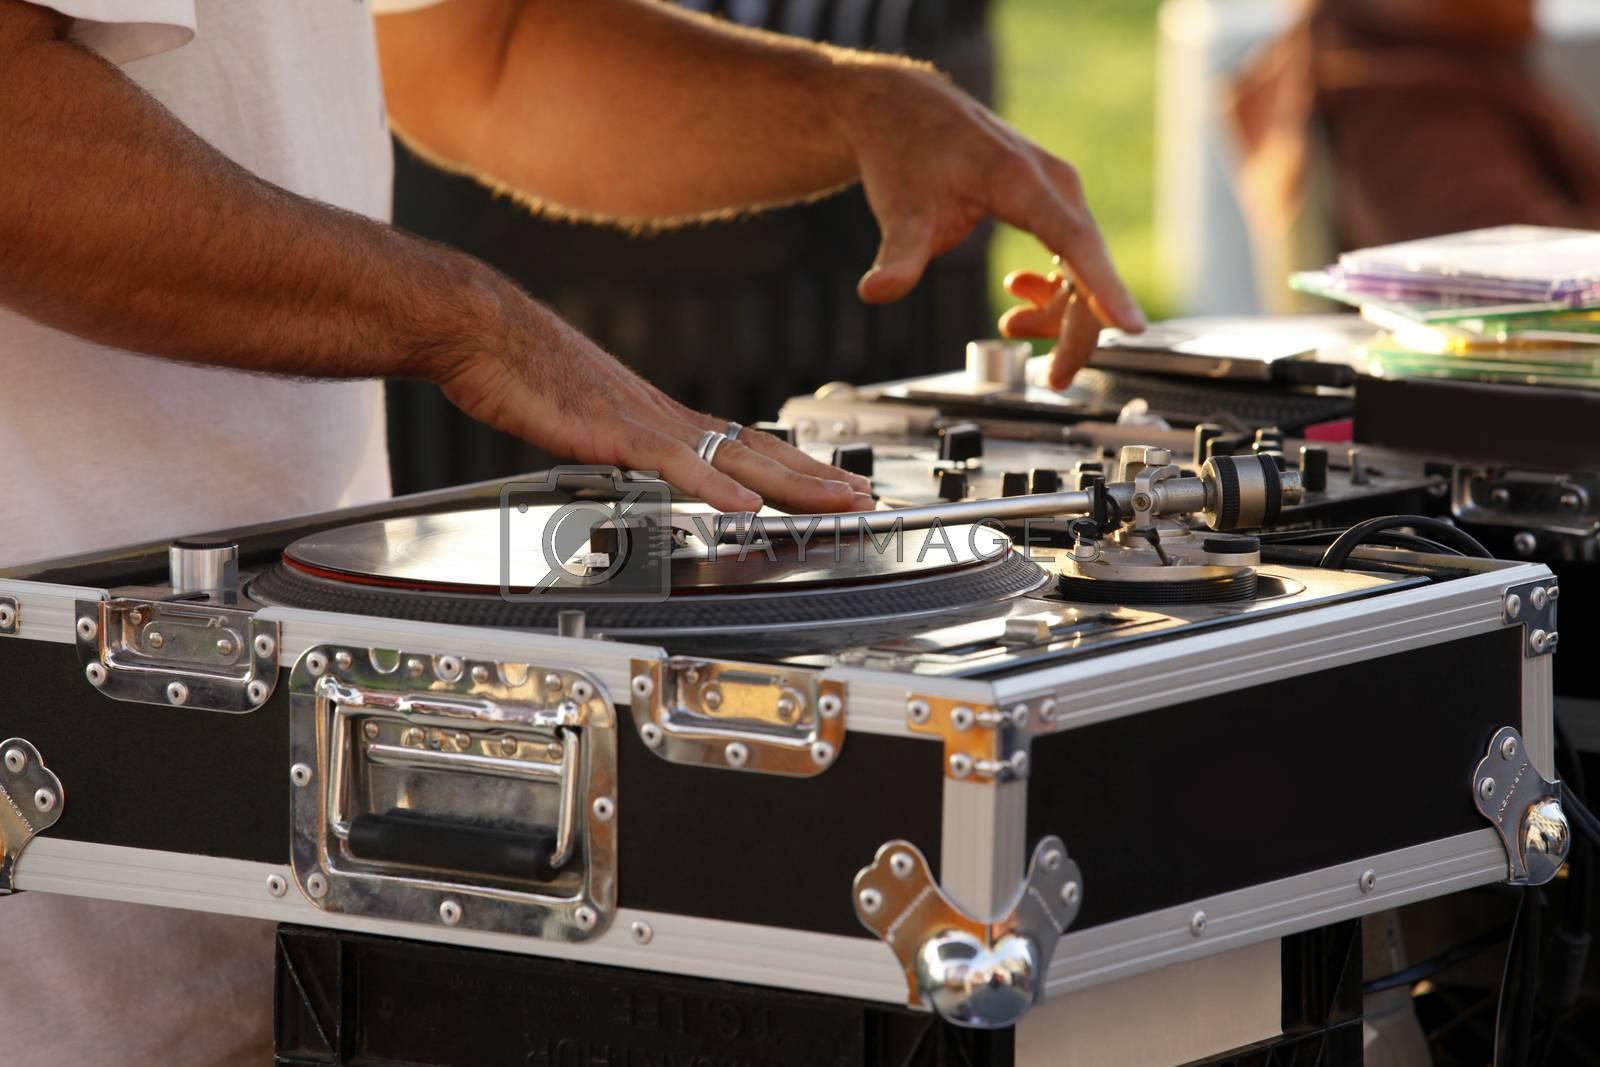 Turntable, hand of dj on the vinyl record on Venice Beach. California, USA